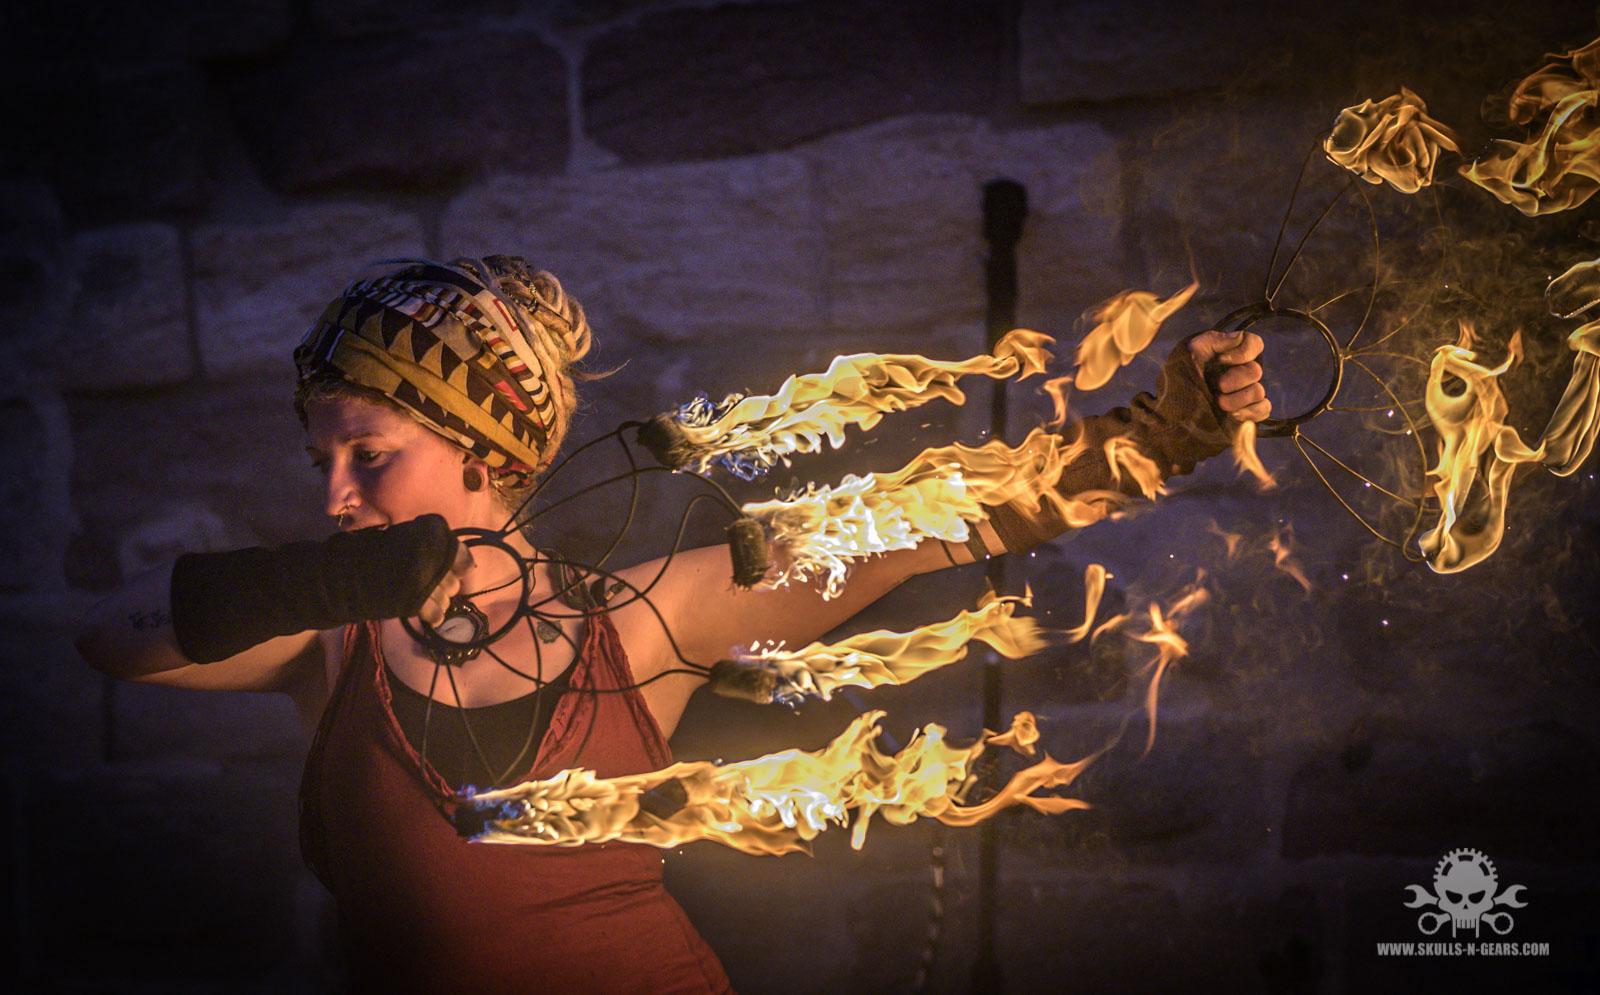 Feuertanz Festival 2019 - Feuershow-1214